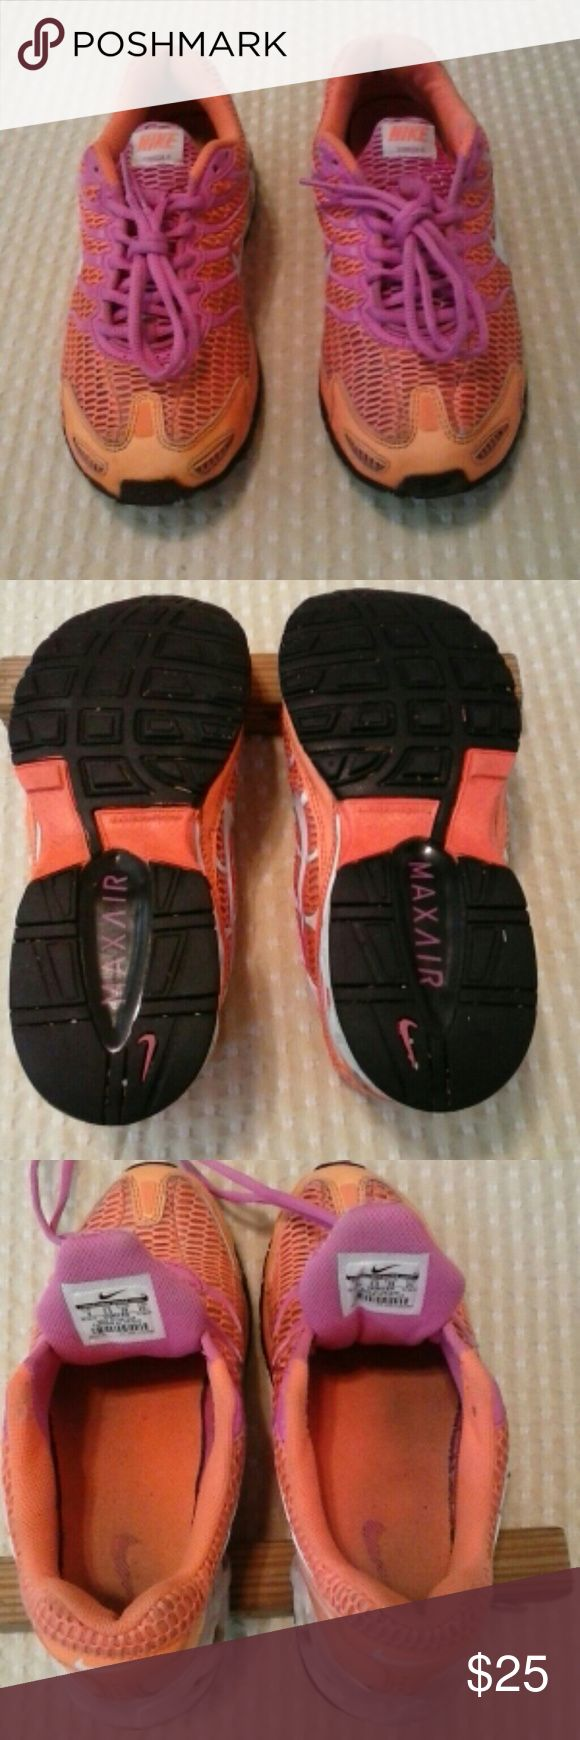 Nike air max torch 4 running shoe - Nike Torch 4 Running Shoes